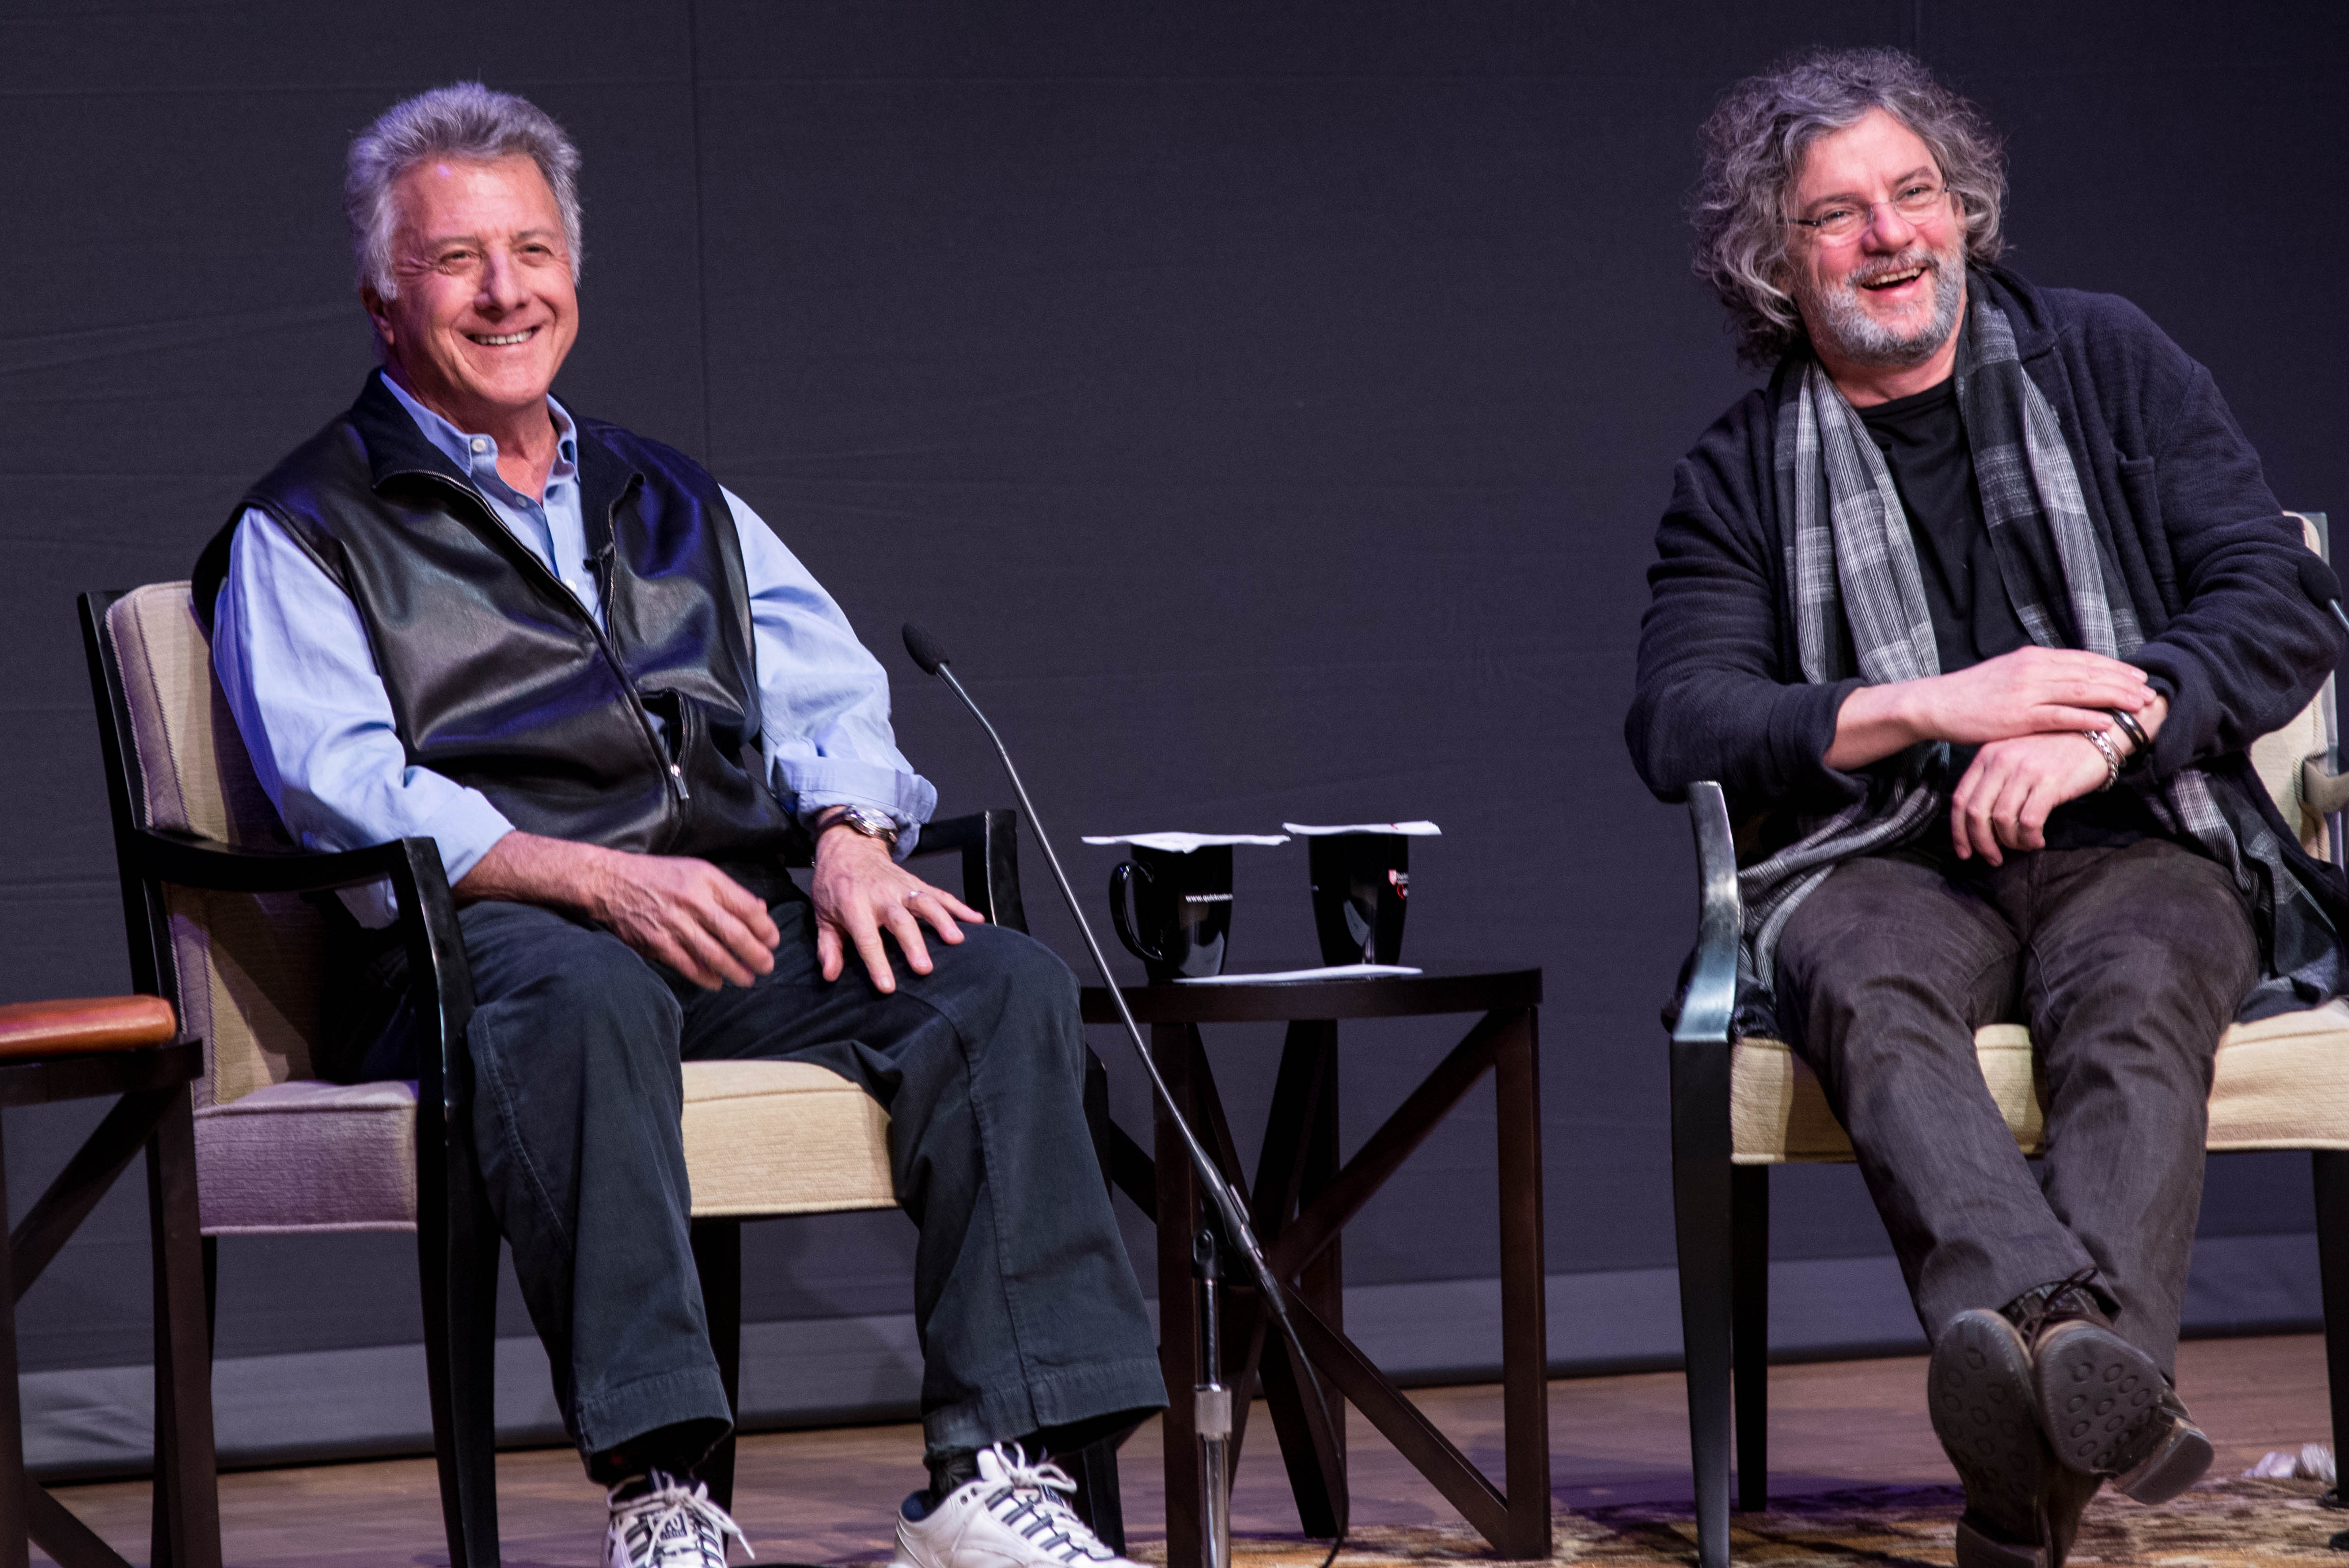 Academy Award-winning actor Dustin Hoffman and director François Girard at a talk at Fairfield University Thursday night.